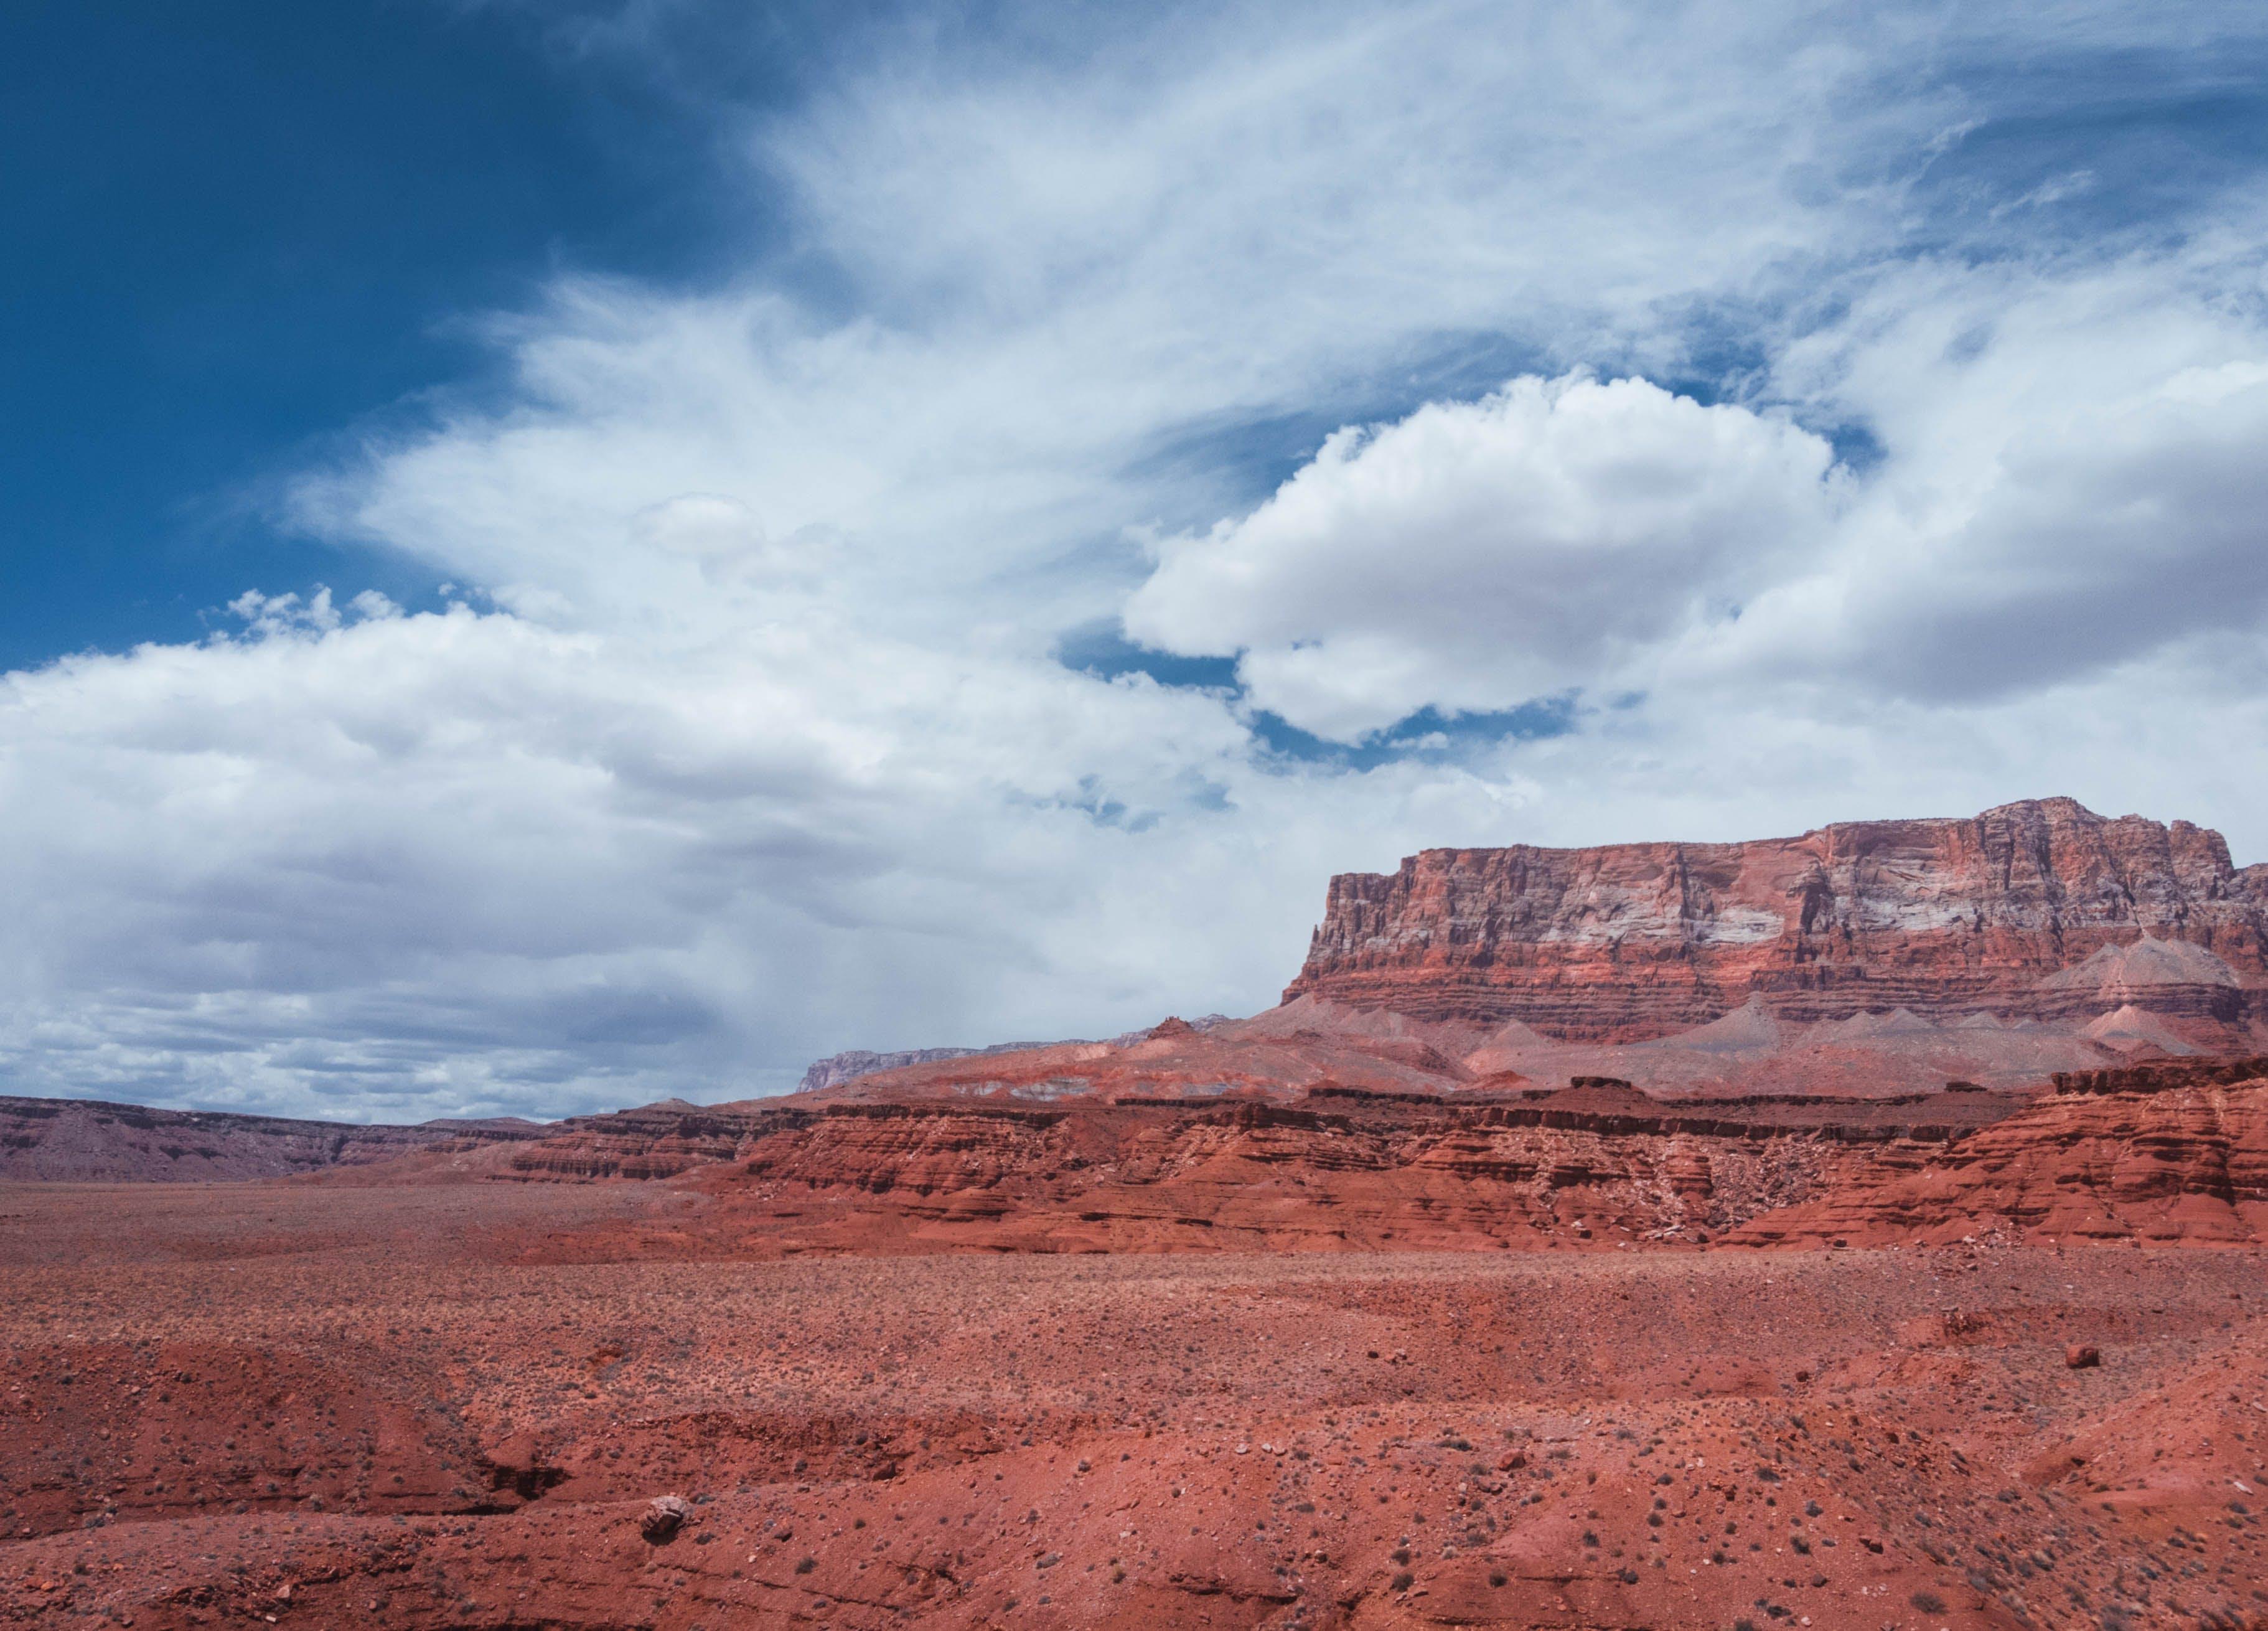 Kostenloses Stock Foto zu arizona, berg, canyon, dürr